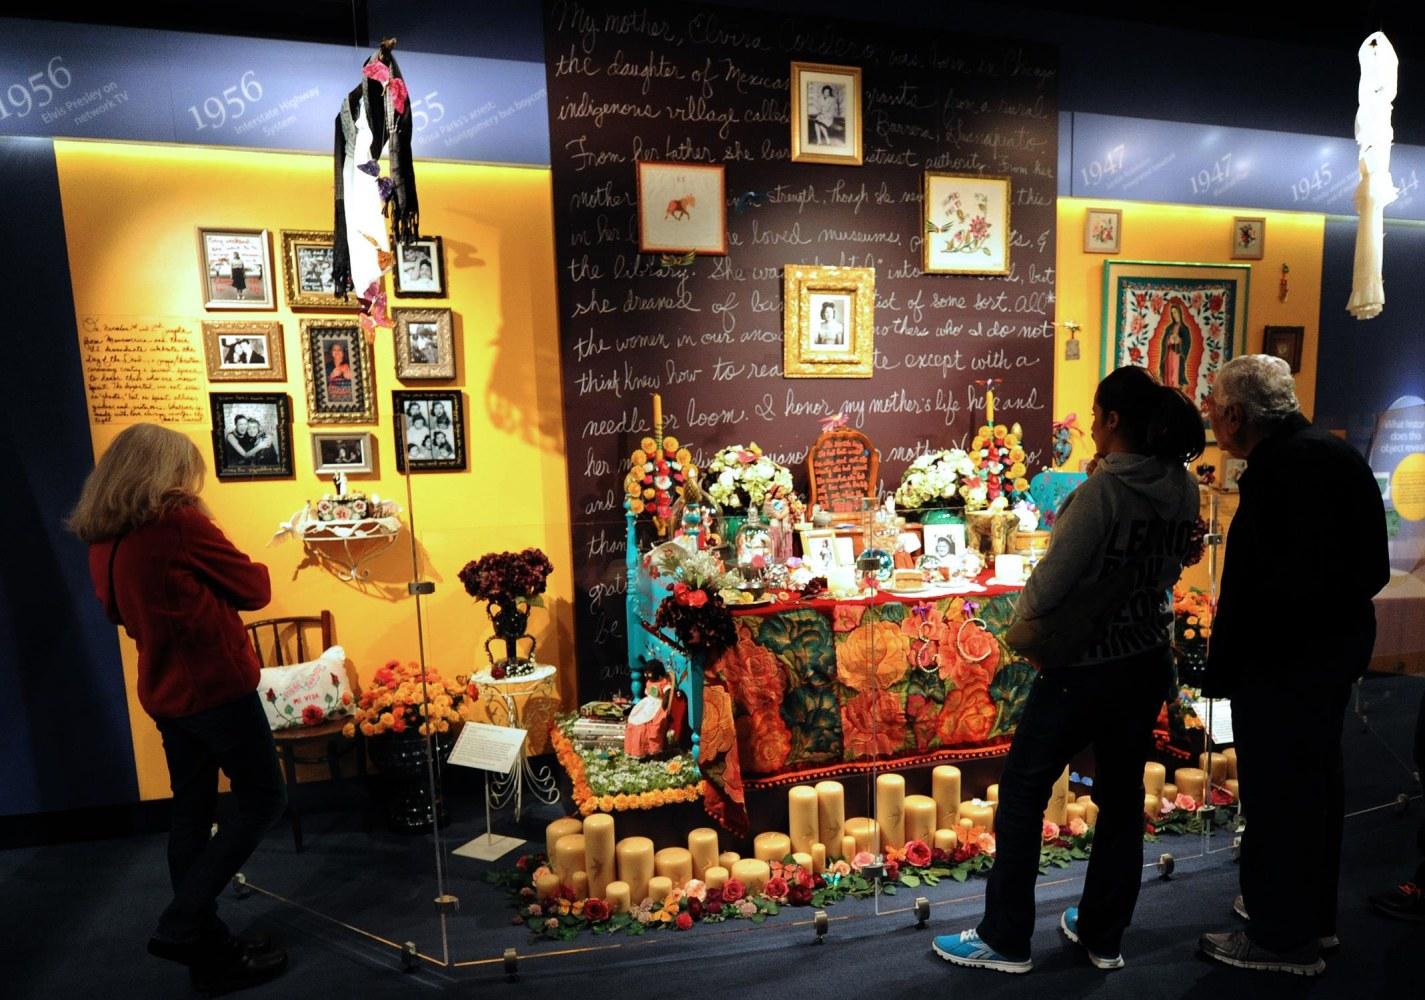 authors artists chefs share dia de los muertos celebrations image dia de los muertos altar